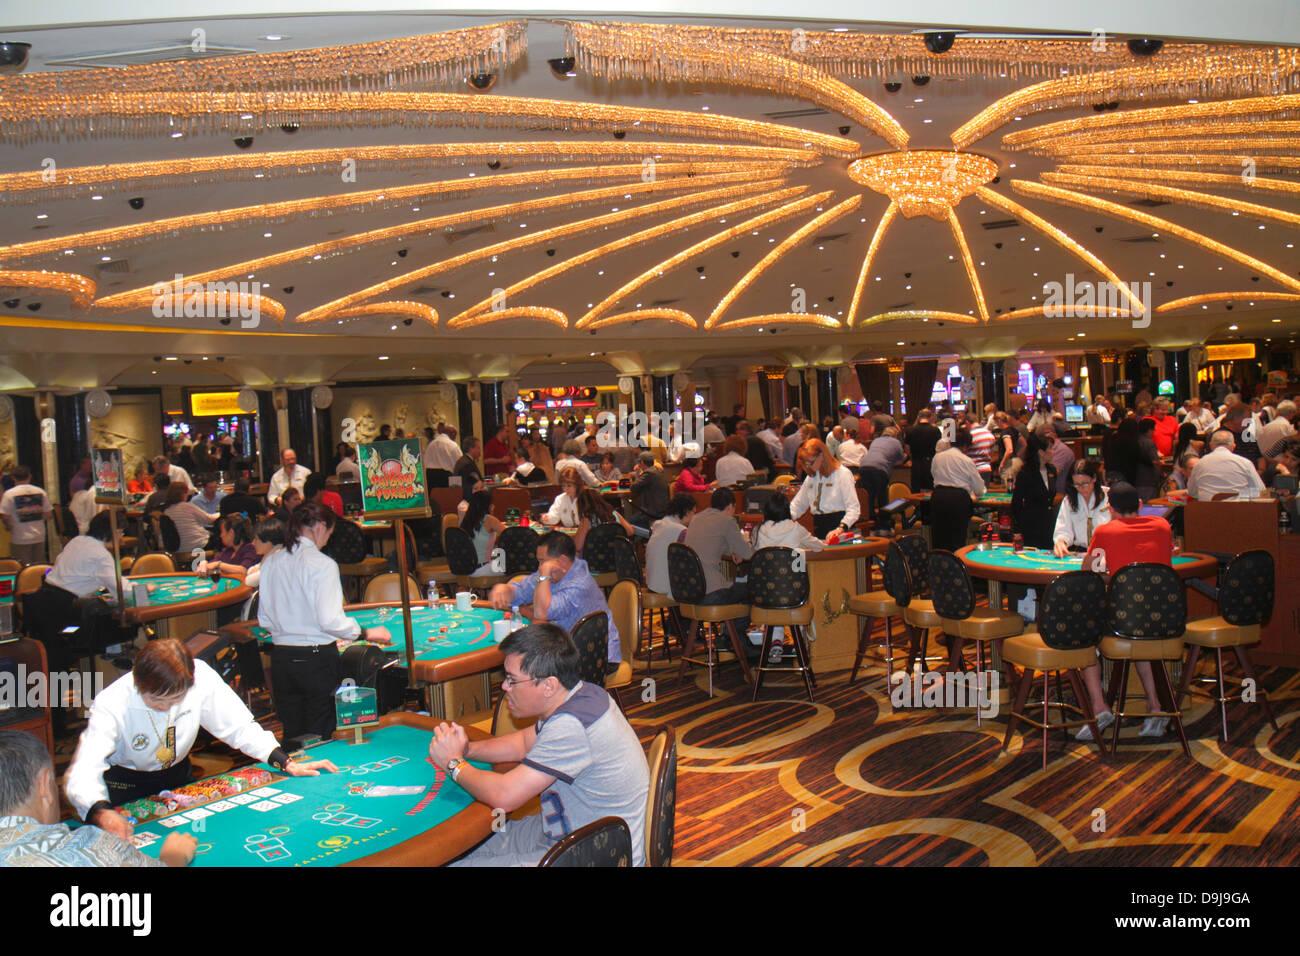 Nevada Las Vegas The Strip South Las Vegas Boulevard Caesars Palace Las Vegas Hotel & Casino gambling gamblers - Stock Image